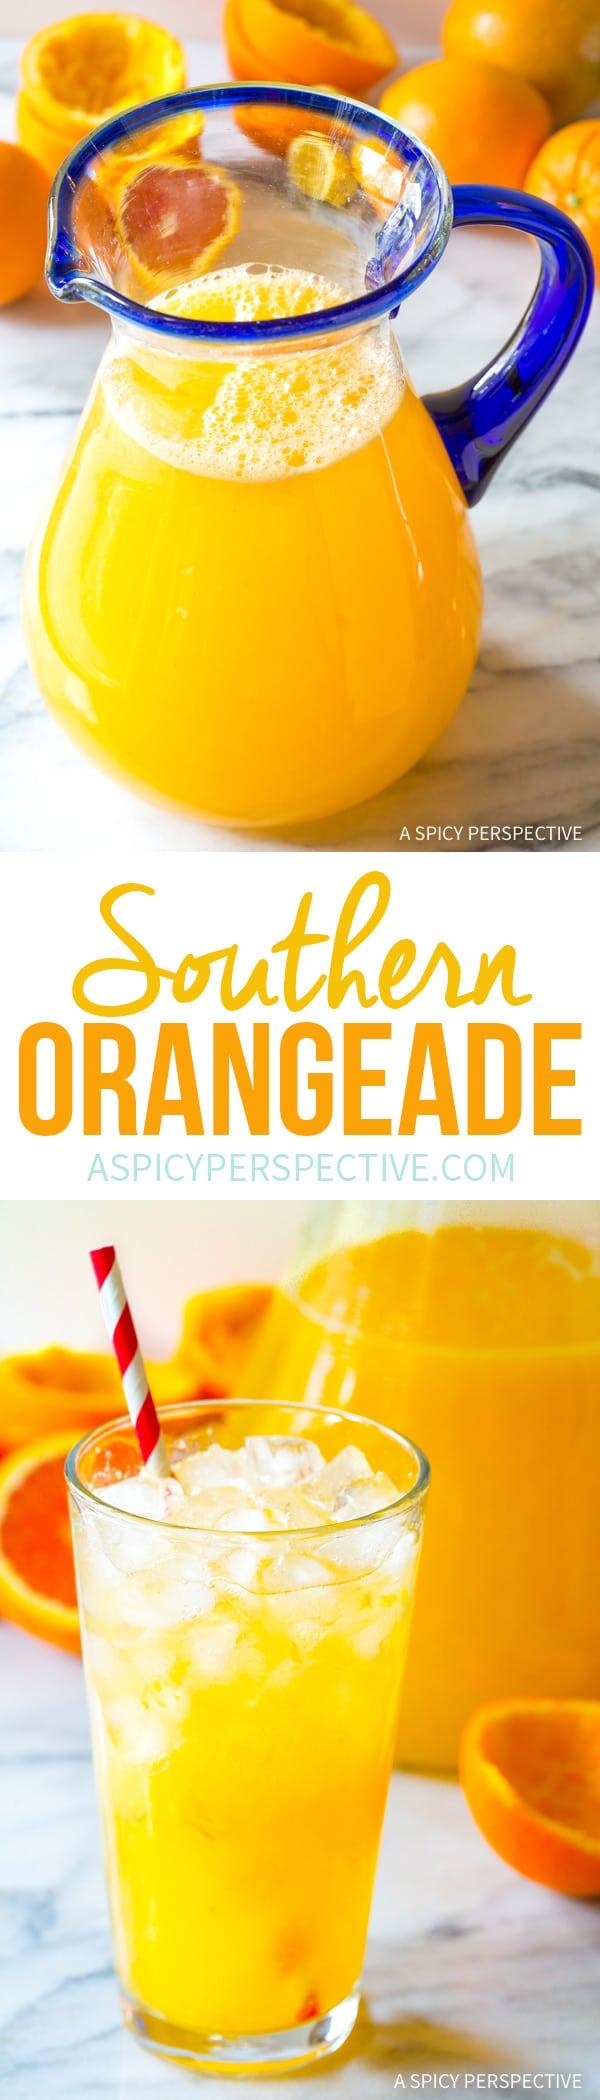 The Best Southern Orangeade Recipe